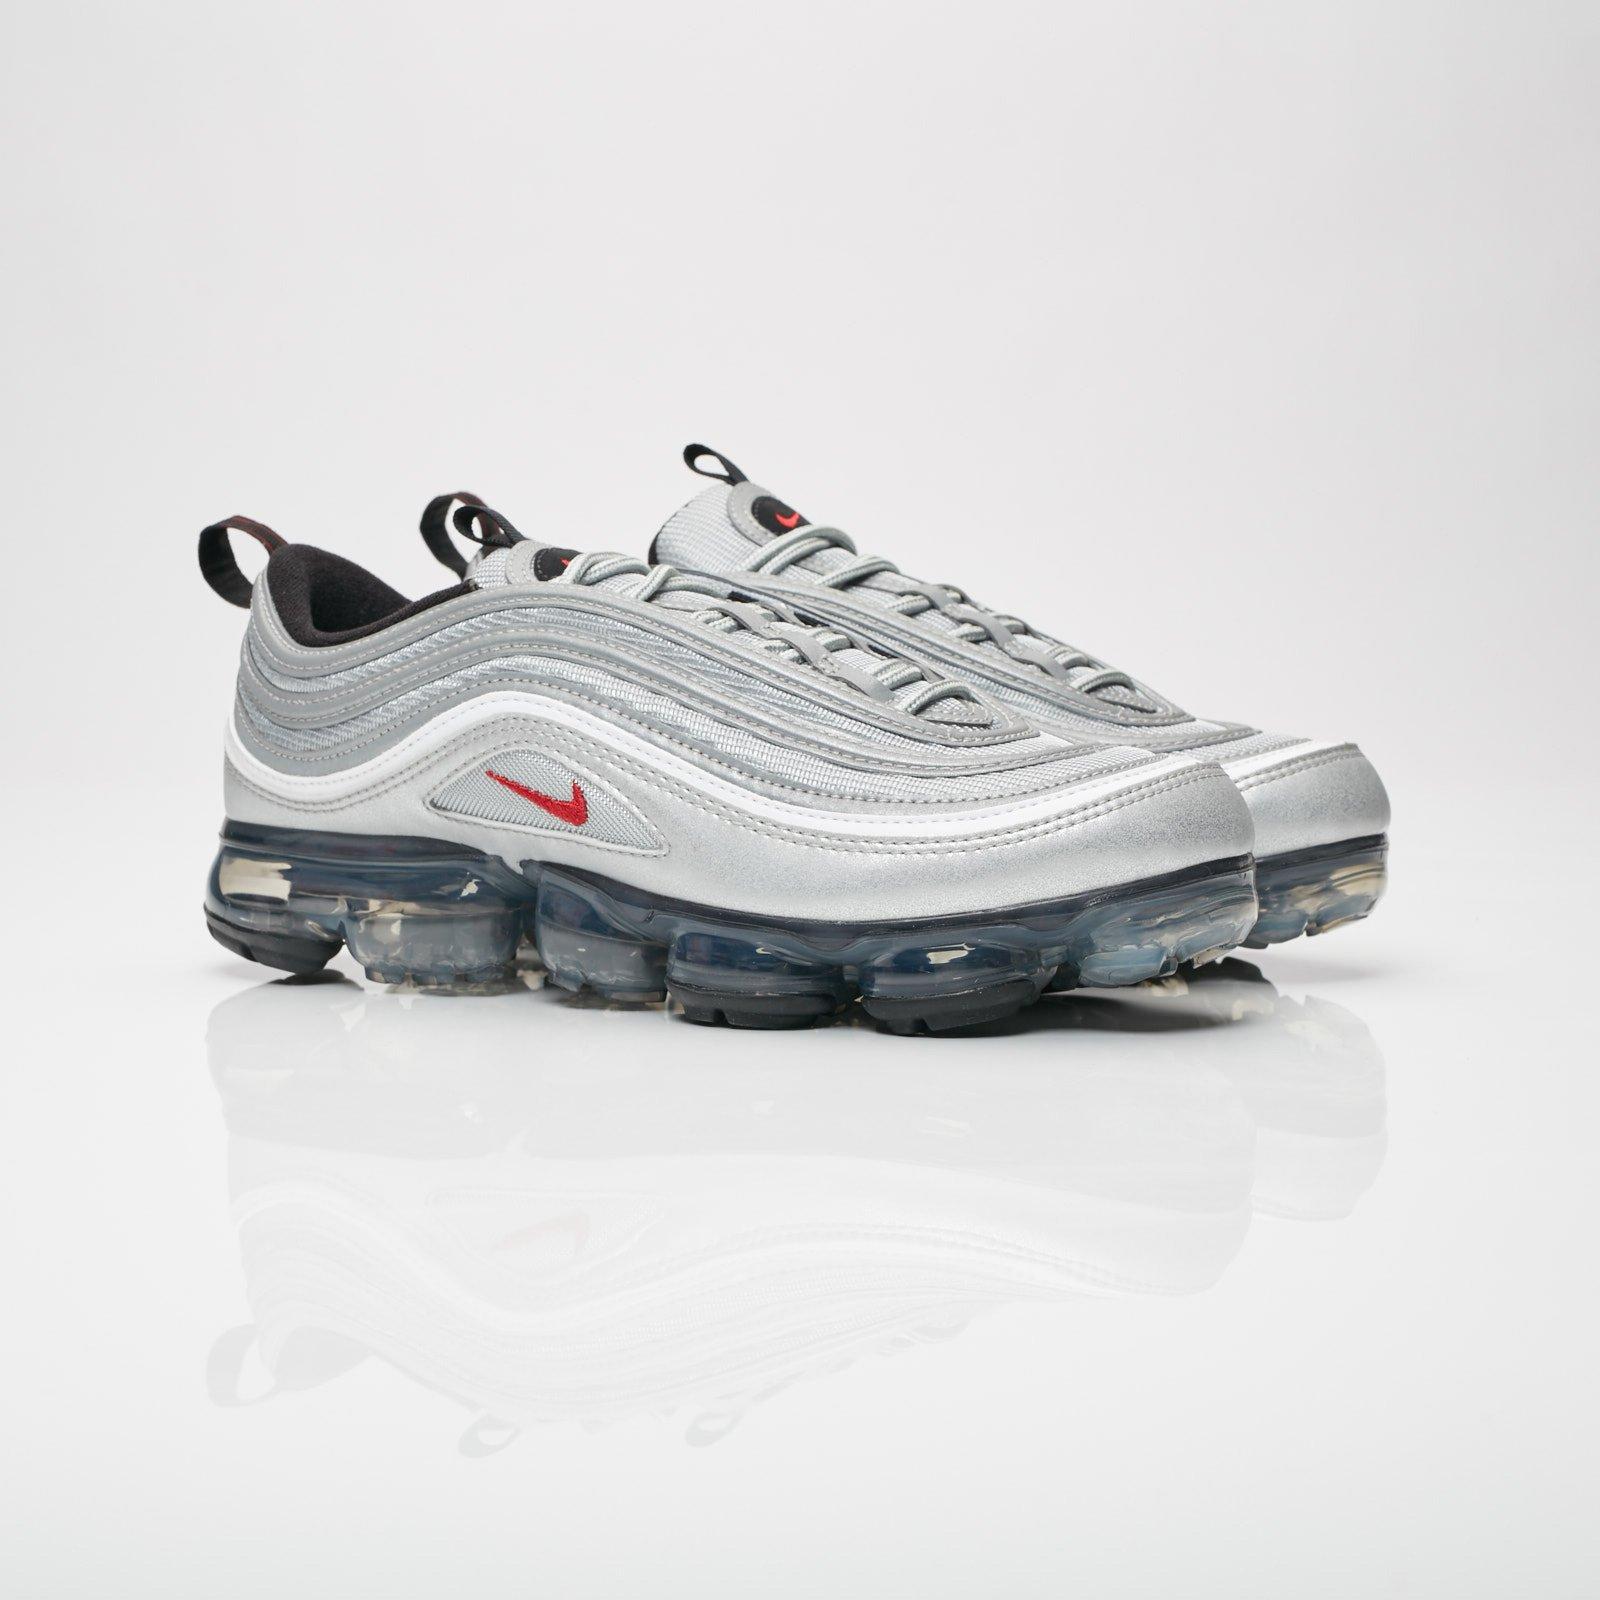 Nike Air Vapormax 97 - Aj7291-002 - Sneakersnstuff  e71ca6e50